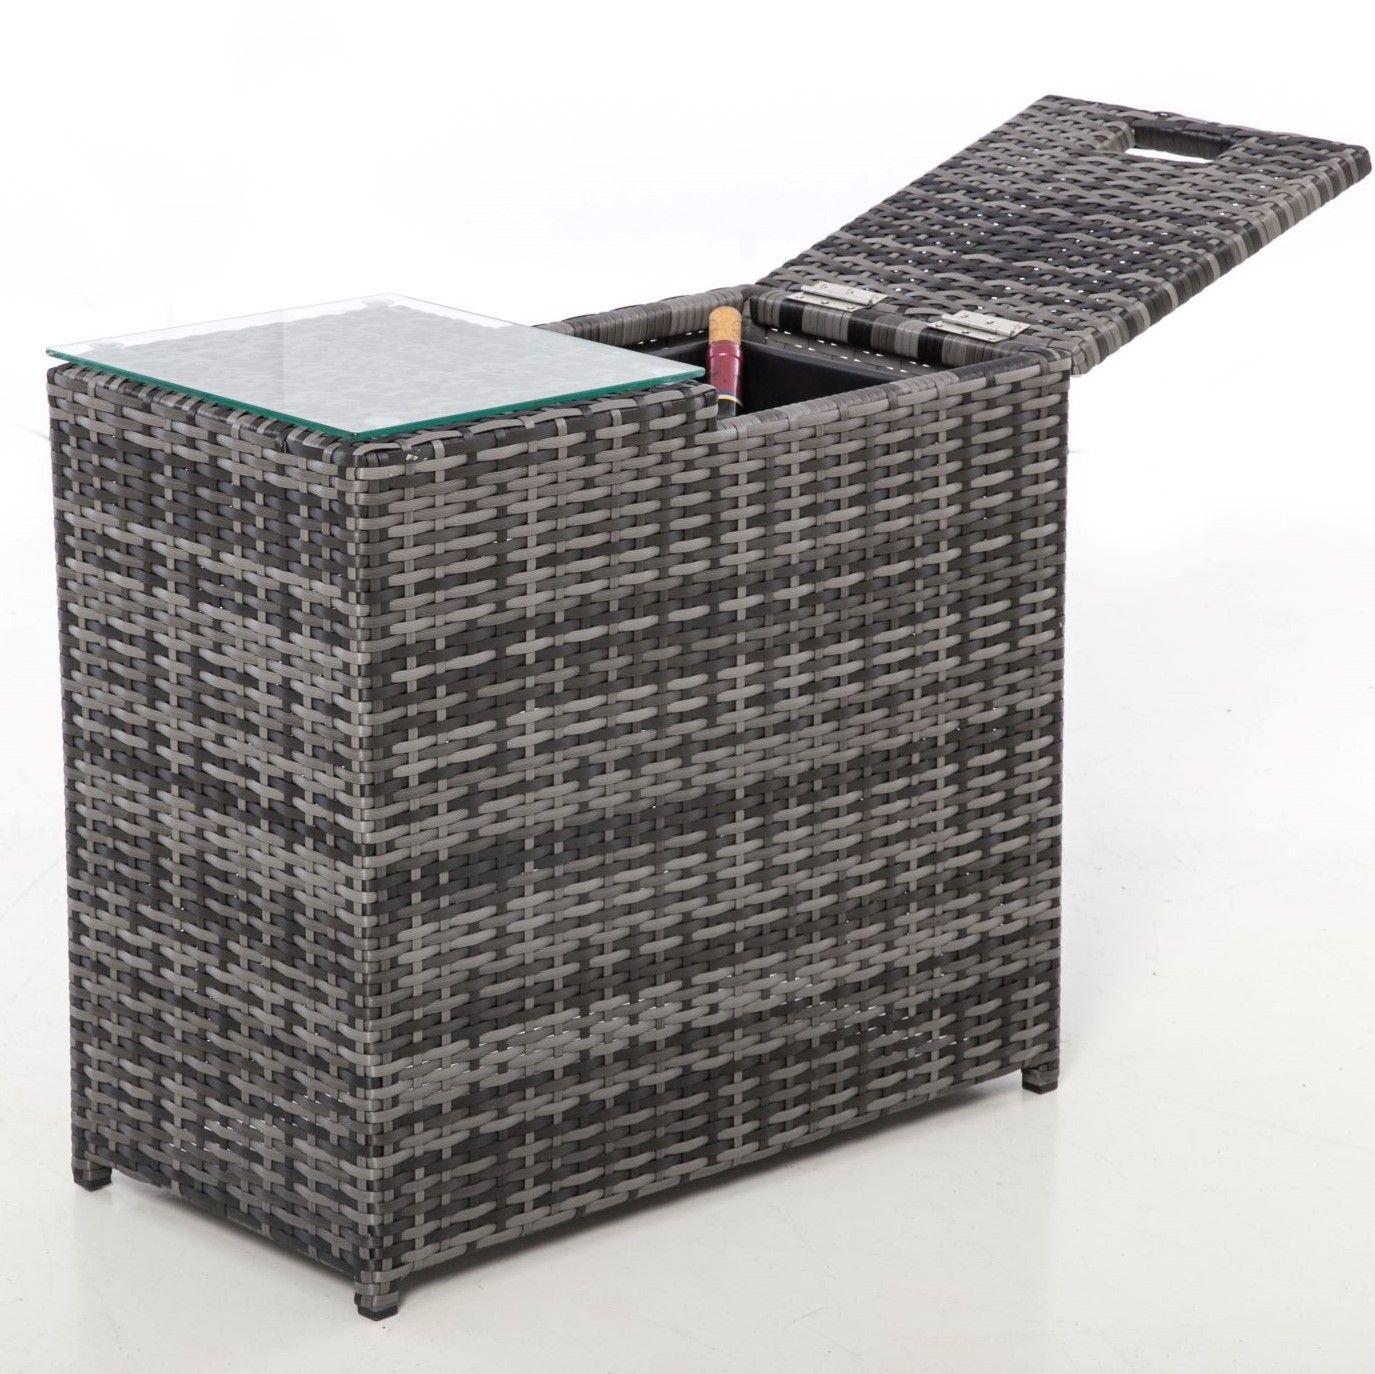 Maze Rattan Garden Furniture Grey Ice Bucket Side Table in 8